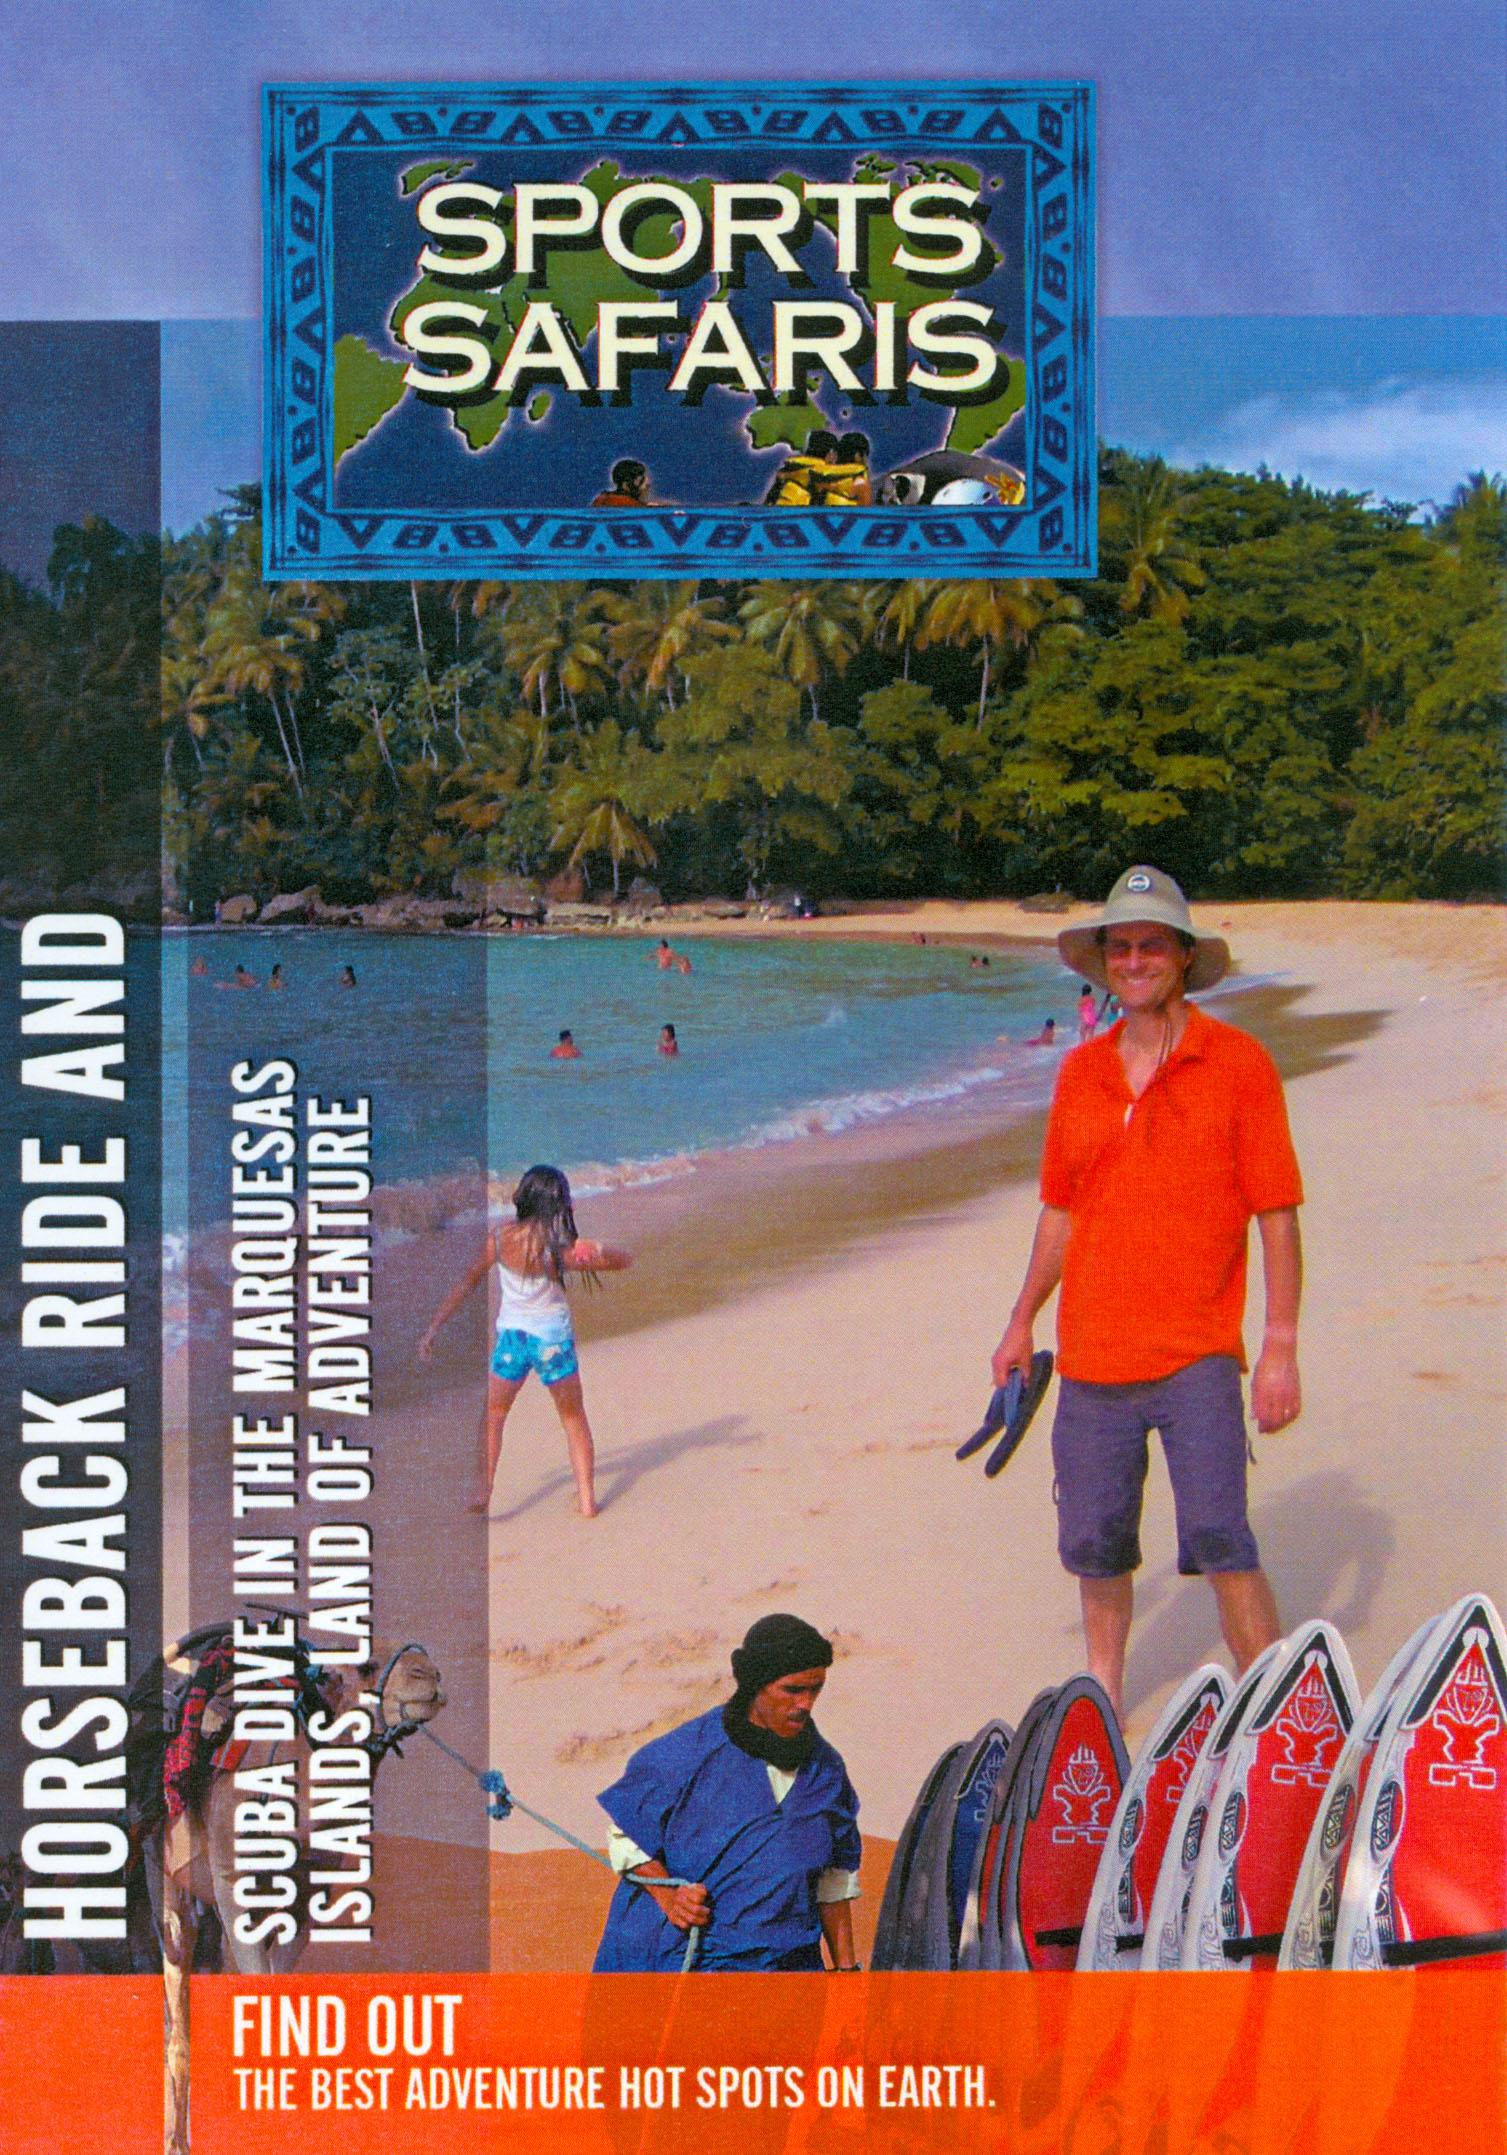 Sports Safaris: Horseback Ride and Scuba Dive in the Marquesas Islands, Land of Adventure